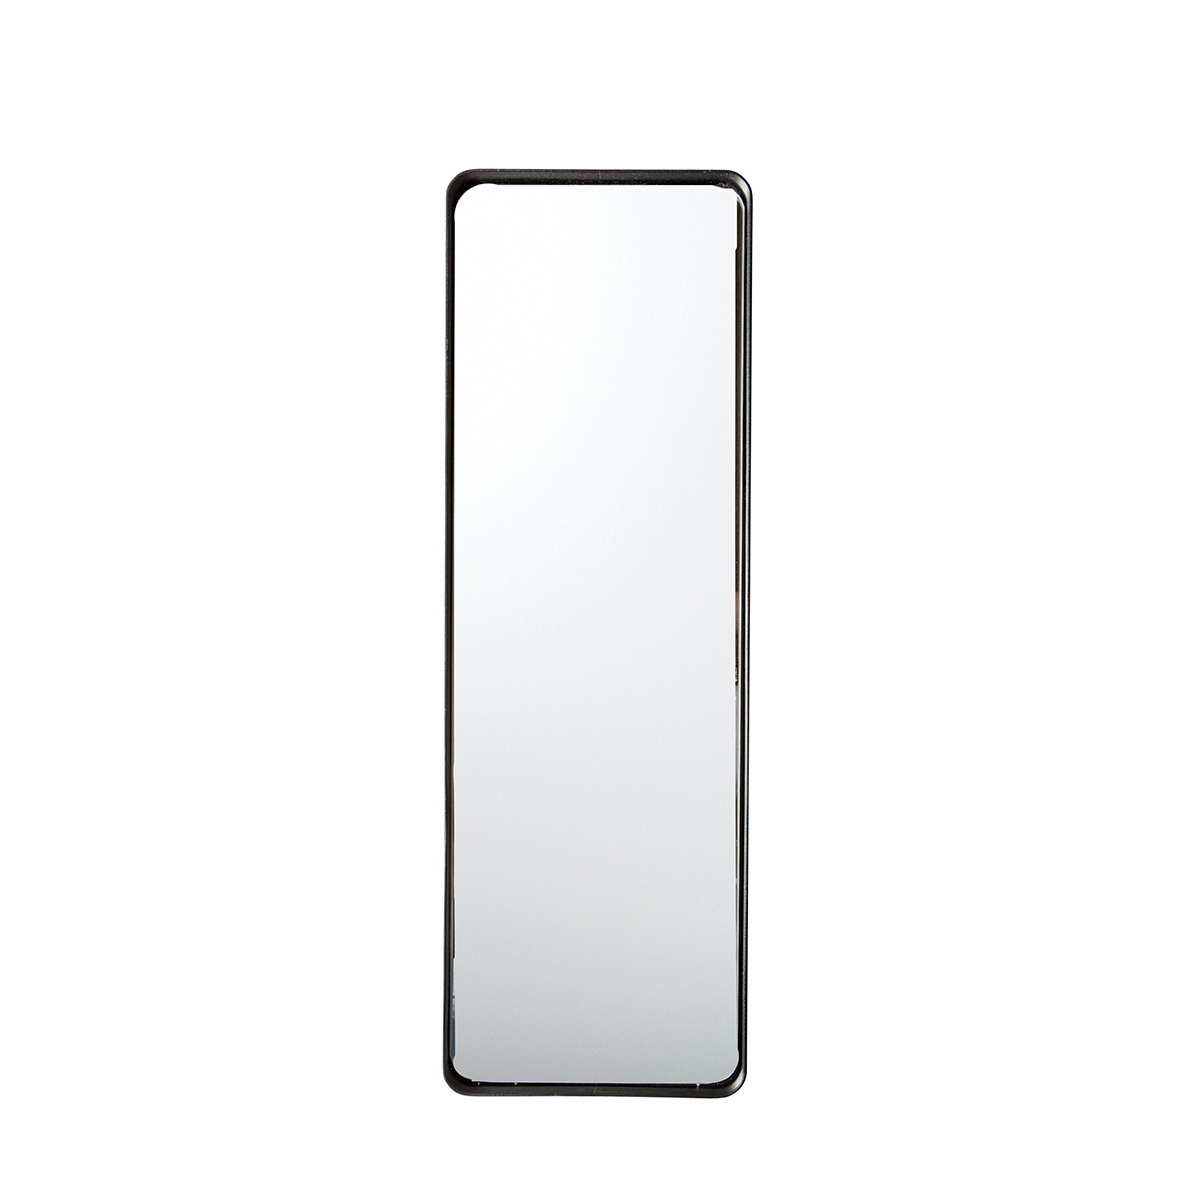 Spegel 60 x 20 cm COMO svart, ByON